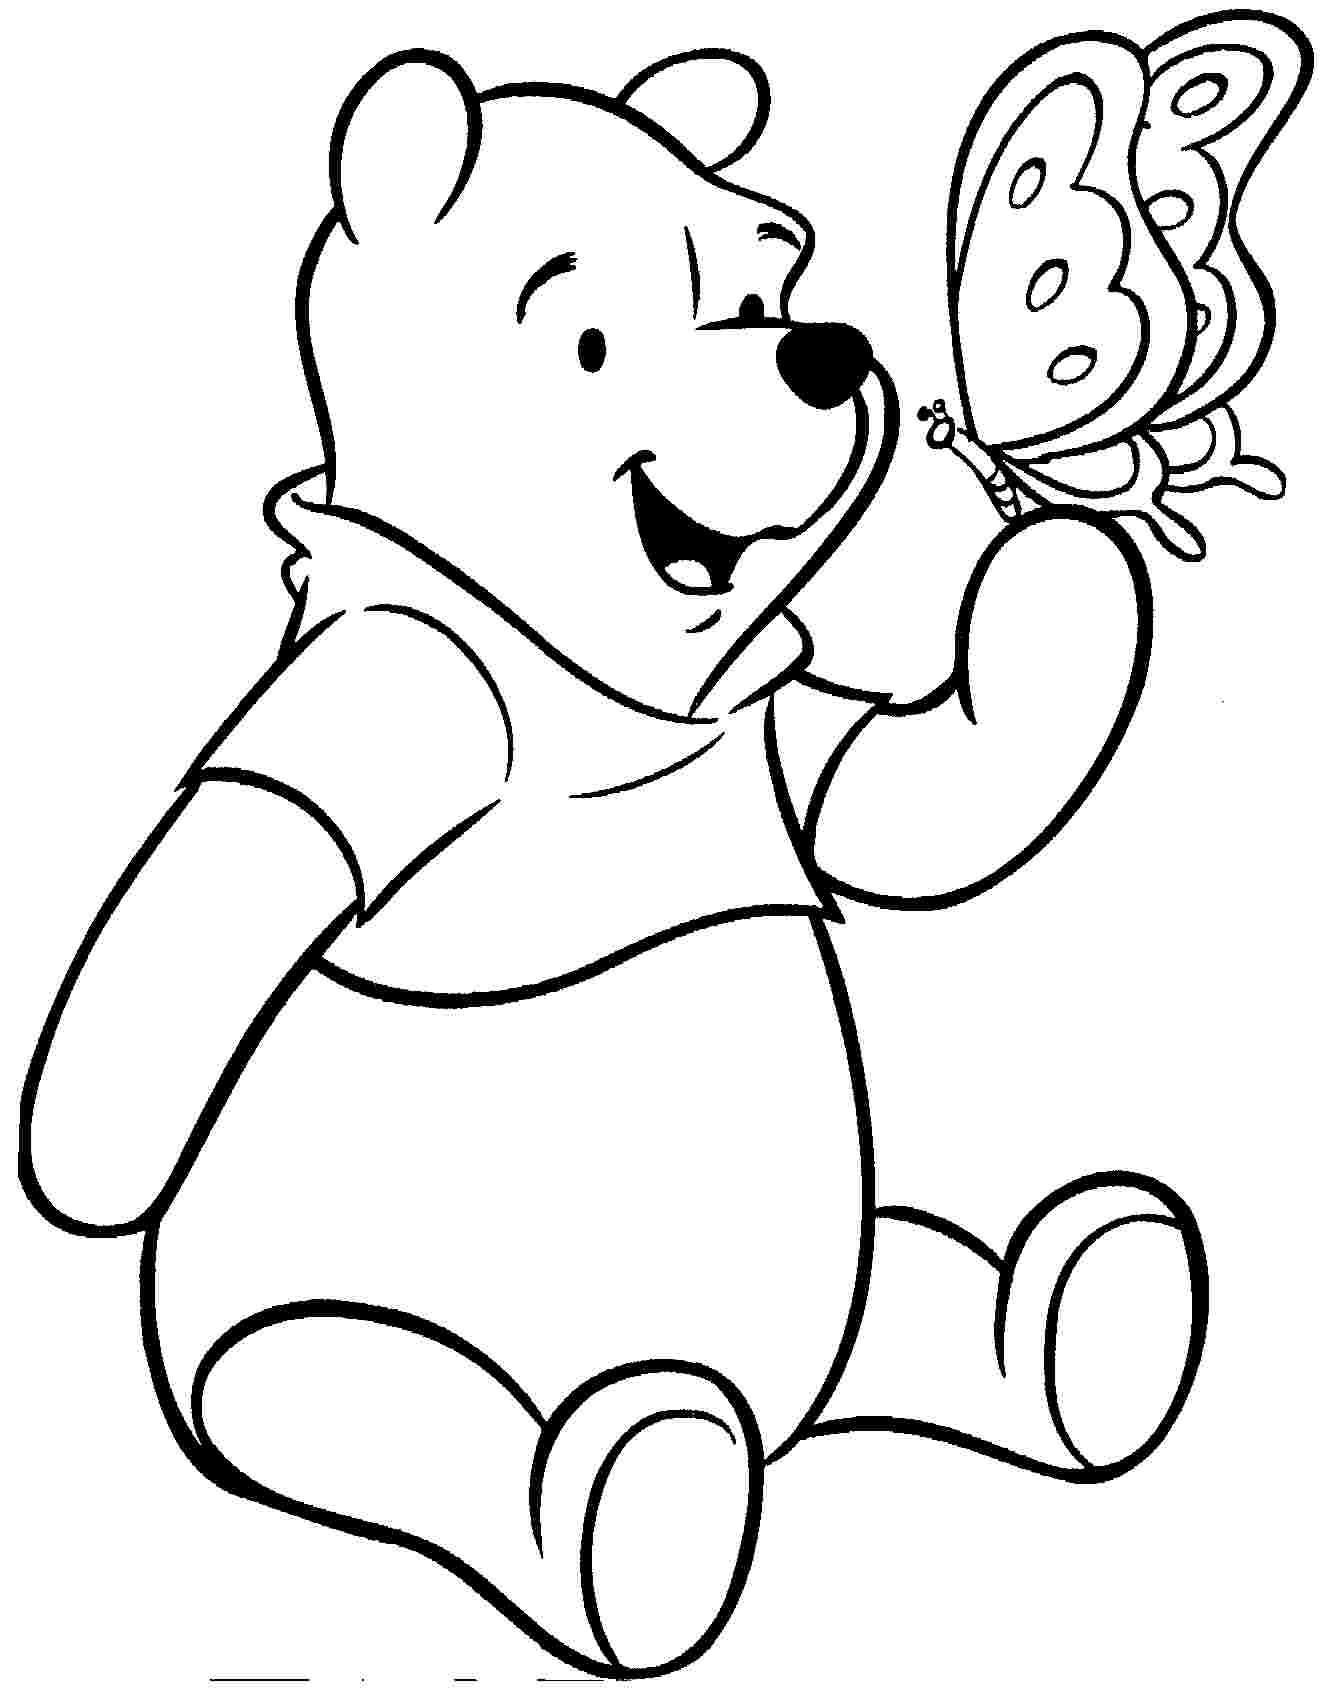 Winnie pooh malvorlagen novel - 28 images - heffalump